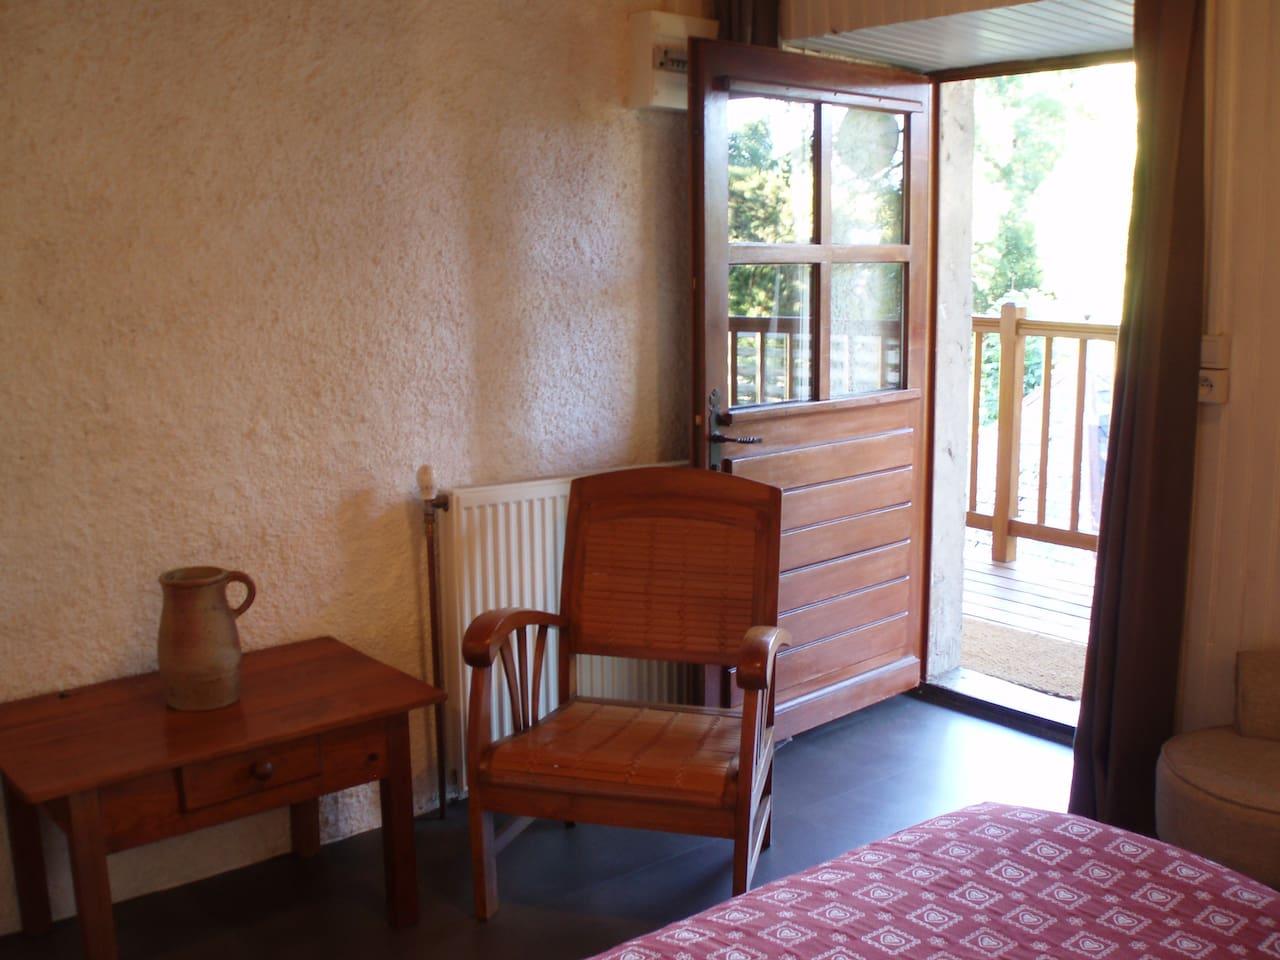 Salle De Bain Giovanni ~ chambre salle de bain ind pendante bed and breakfasts for rent in